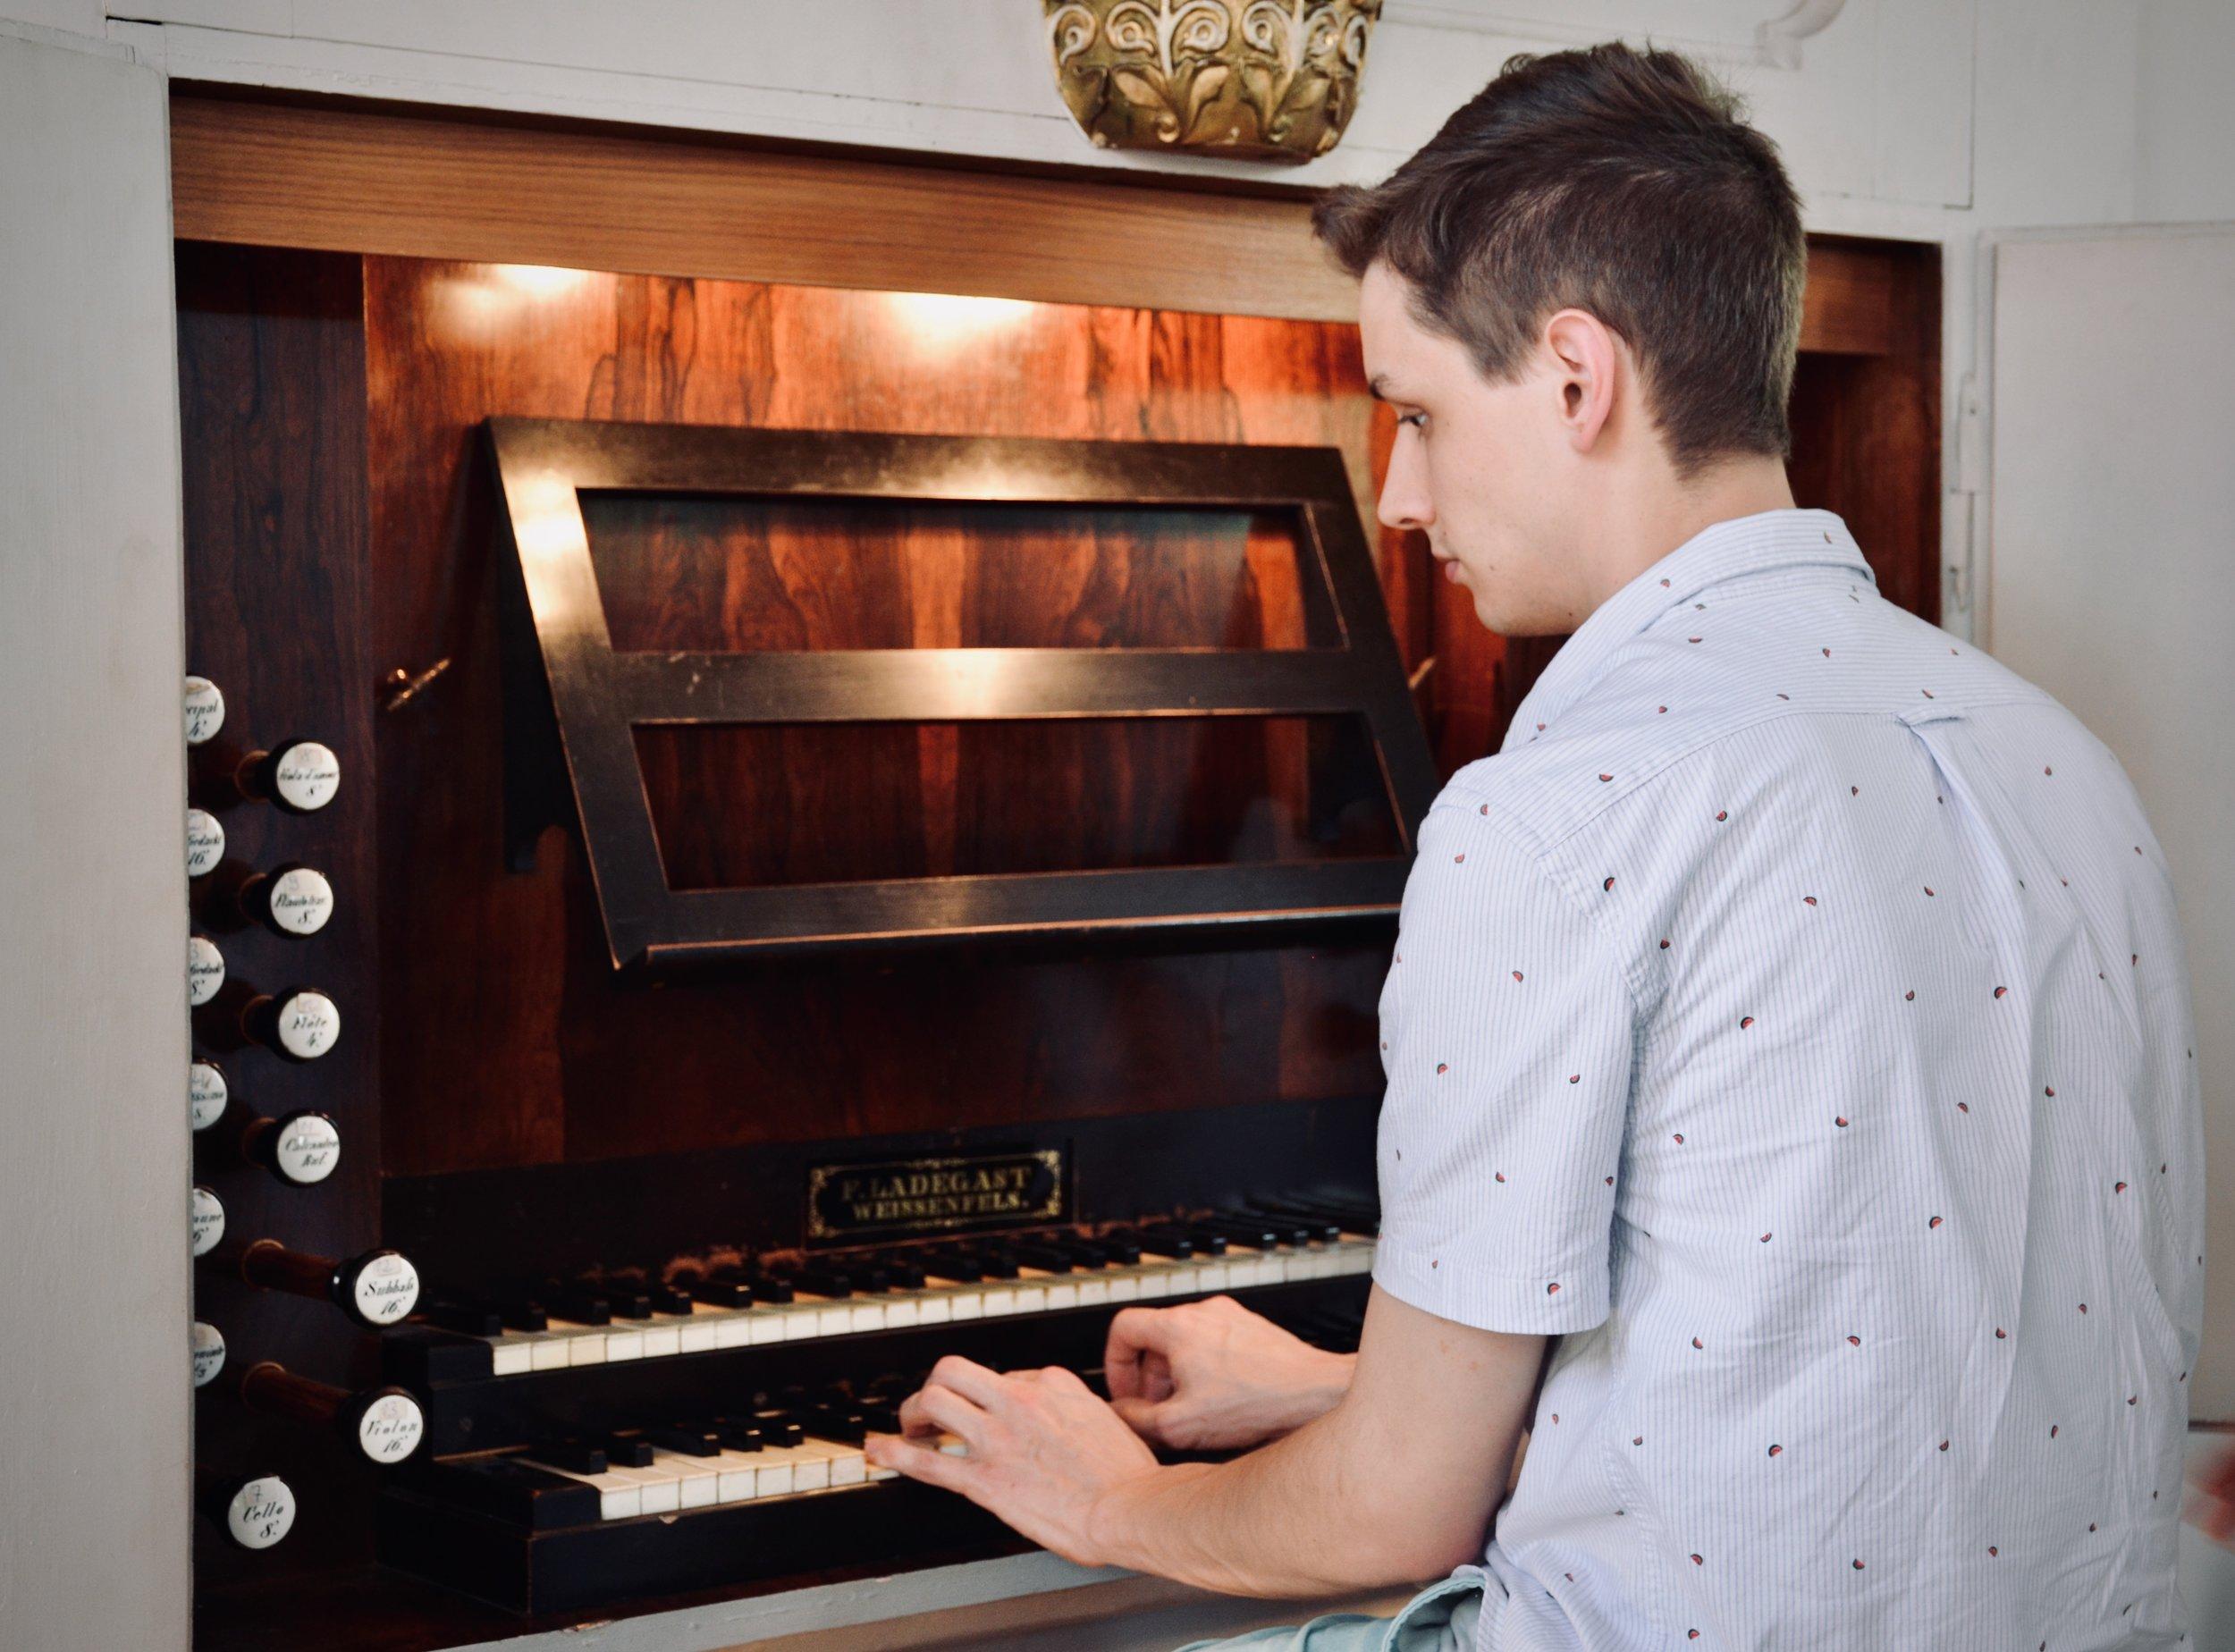 Alex Ross plays the 1869 Ladegast Organ, Marien-Magdalenen-Kirche, Naumburg.